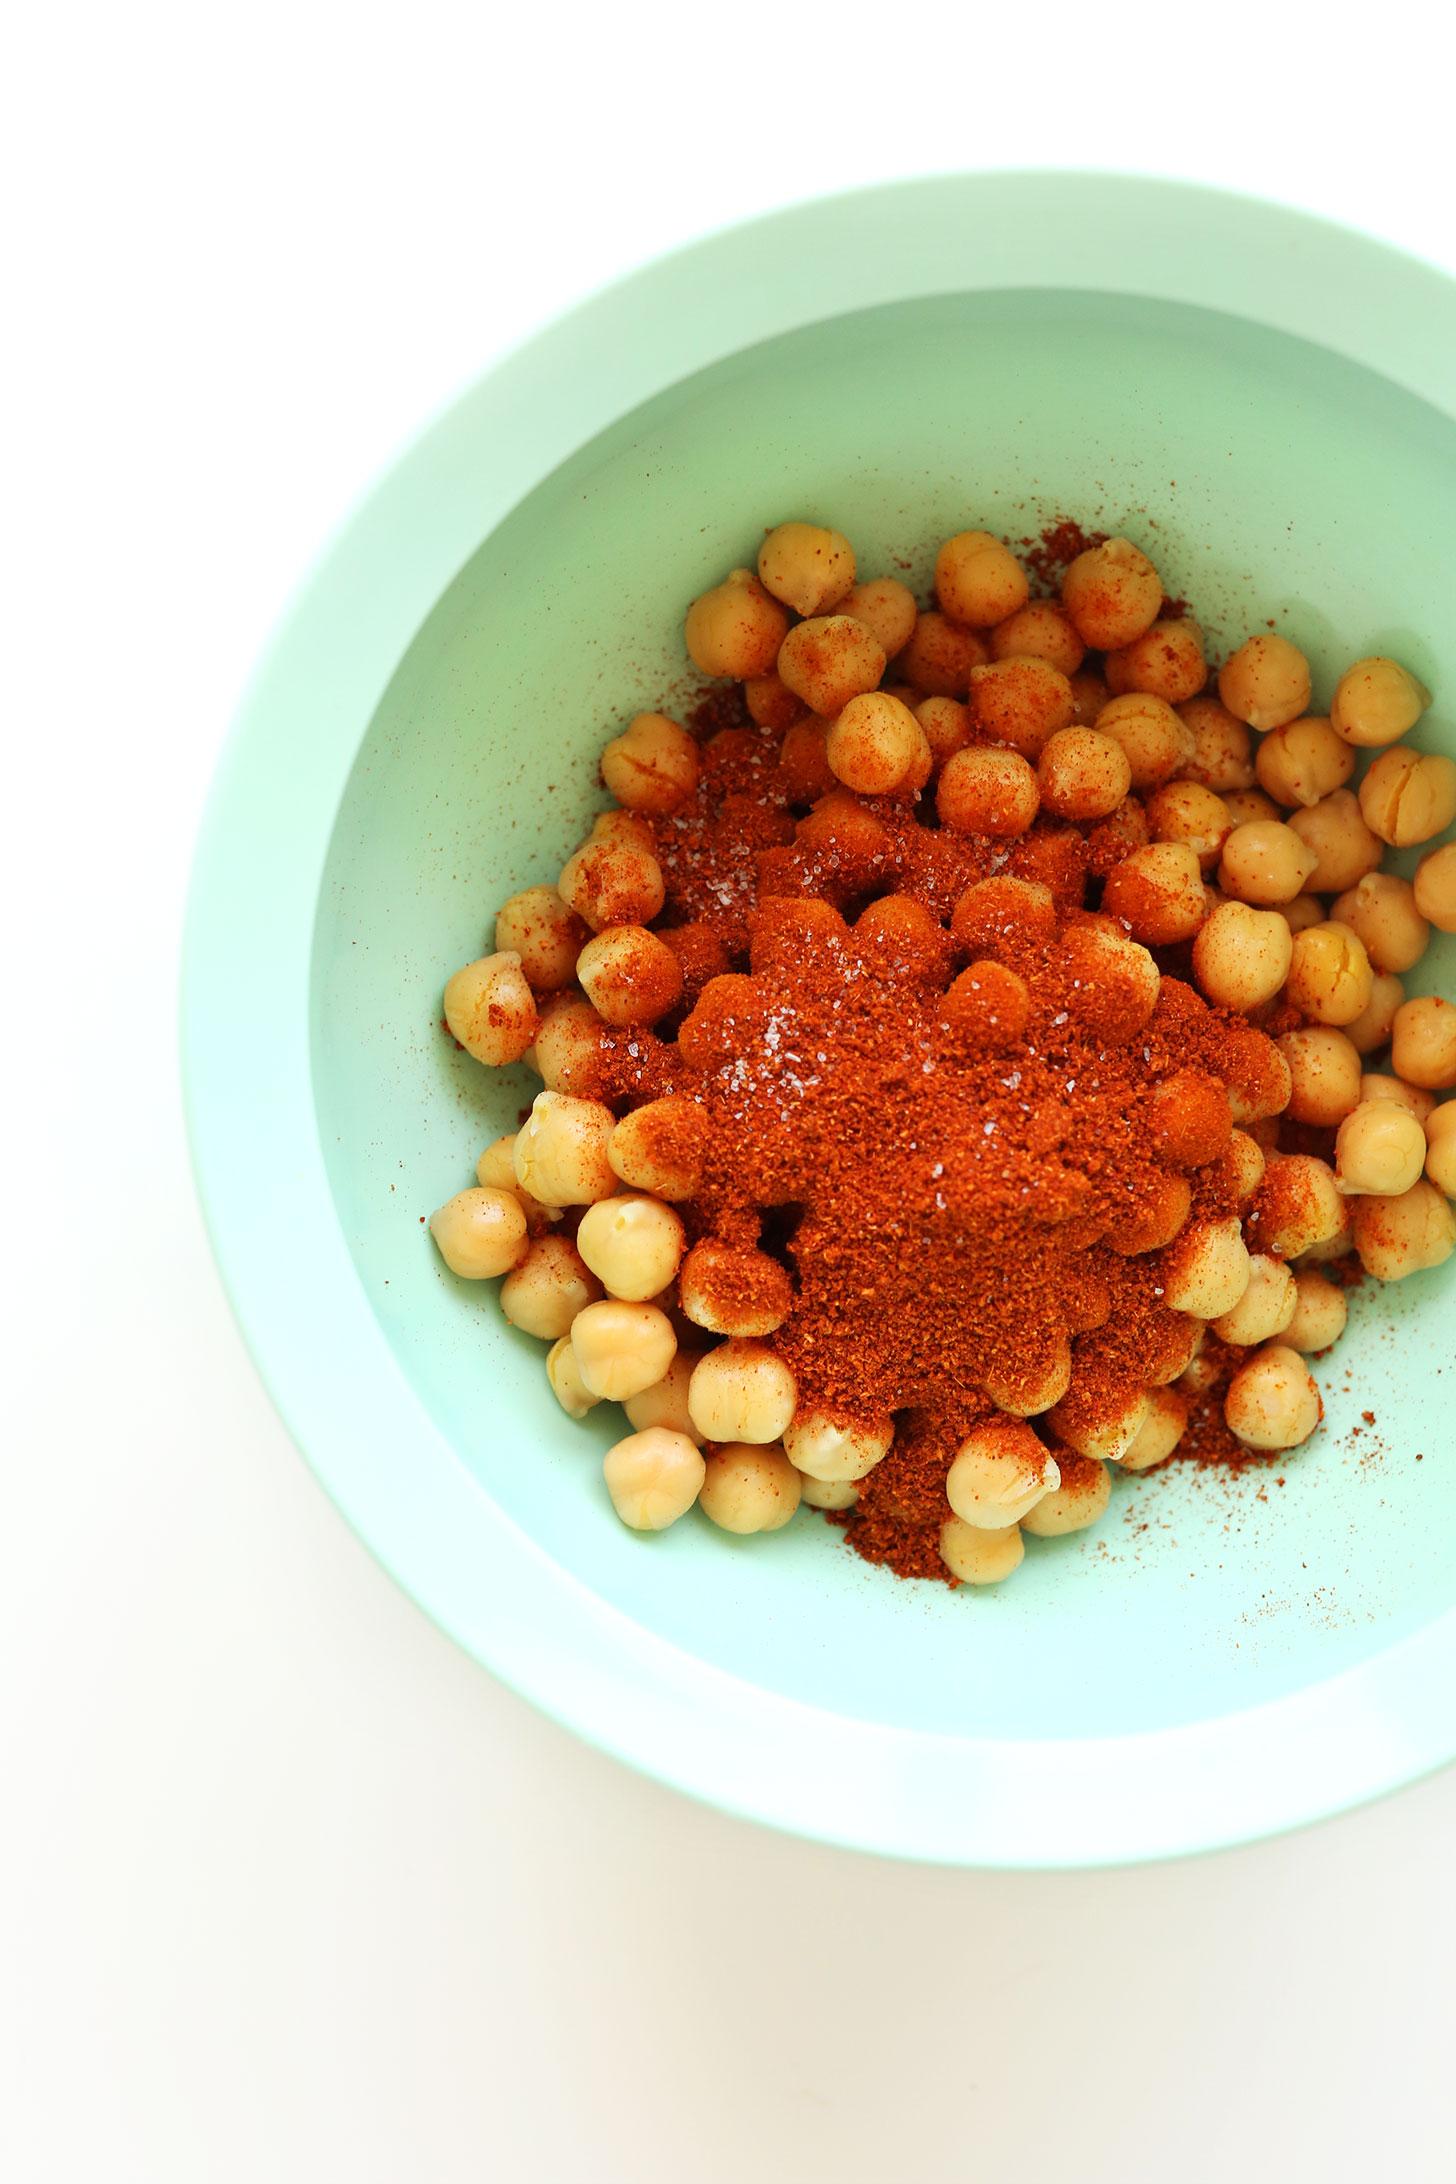 EASY Crispy Chickpeas Recipe #vegan #glutenfree #minimalistbaker